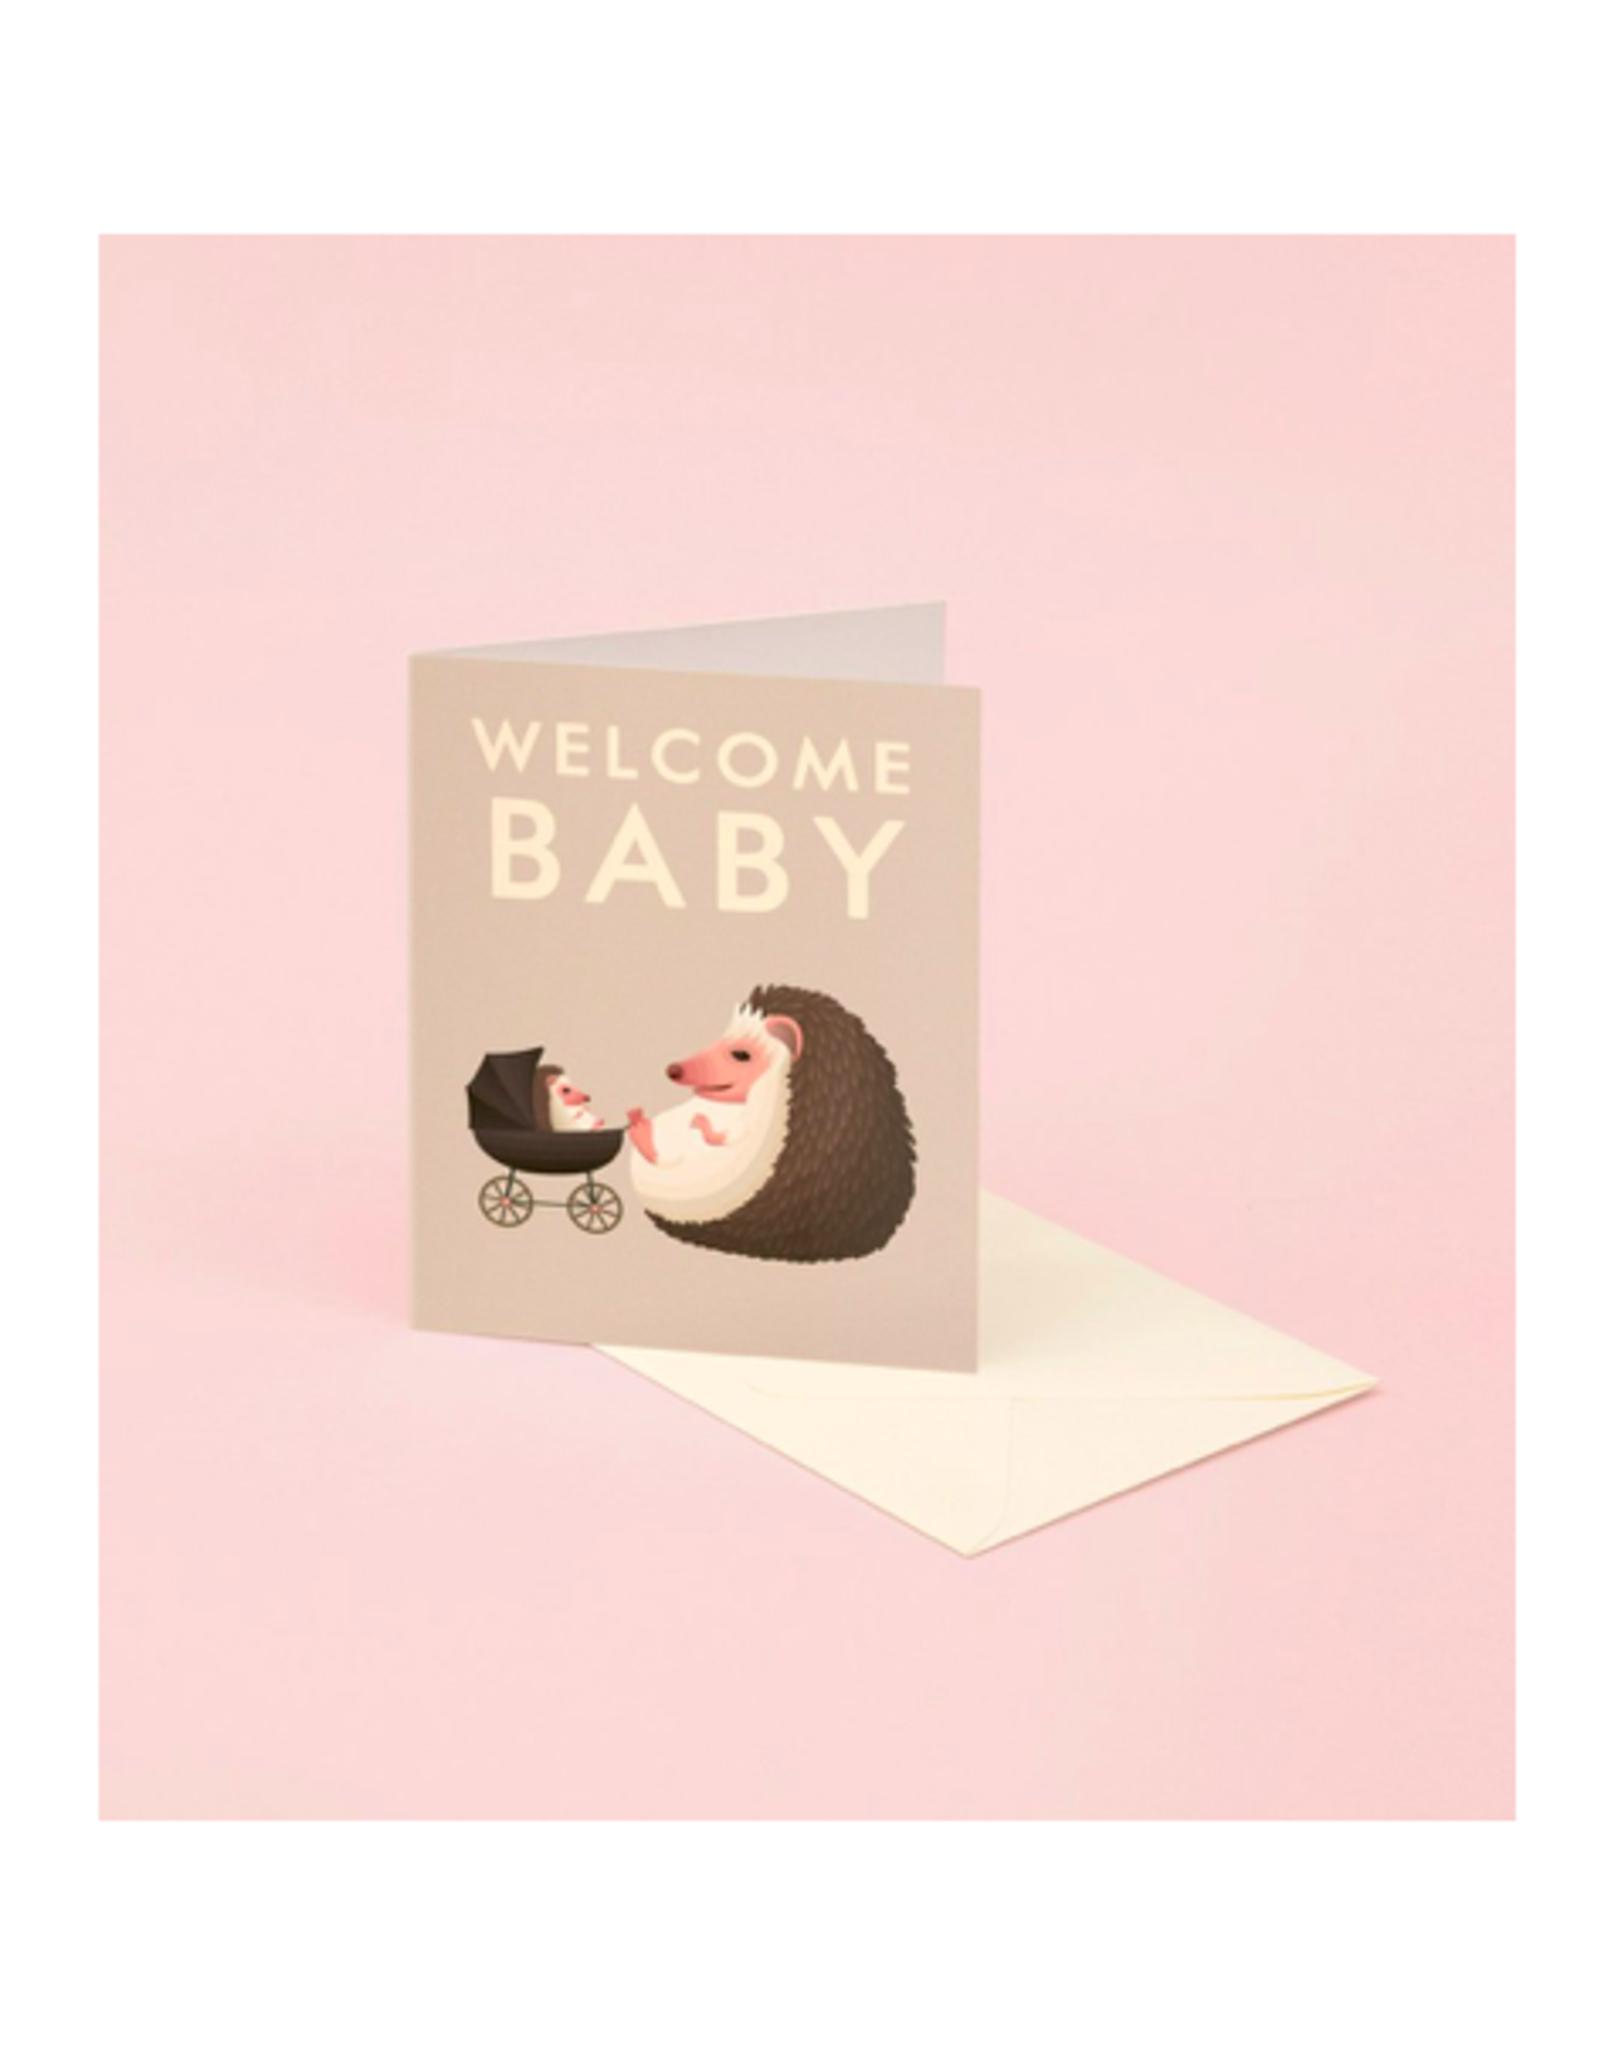 "CAP - Card / Welcome Baby, Hedgehog, 4.25 x 5.5"""